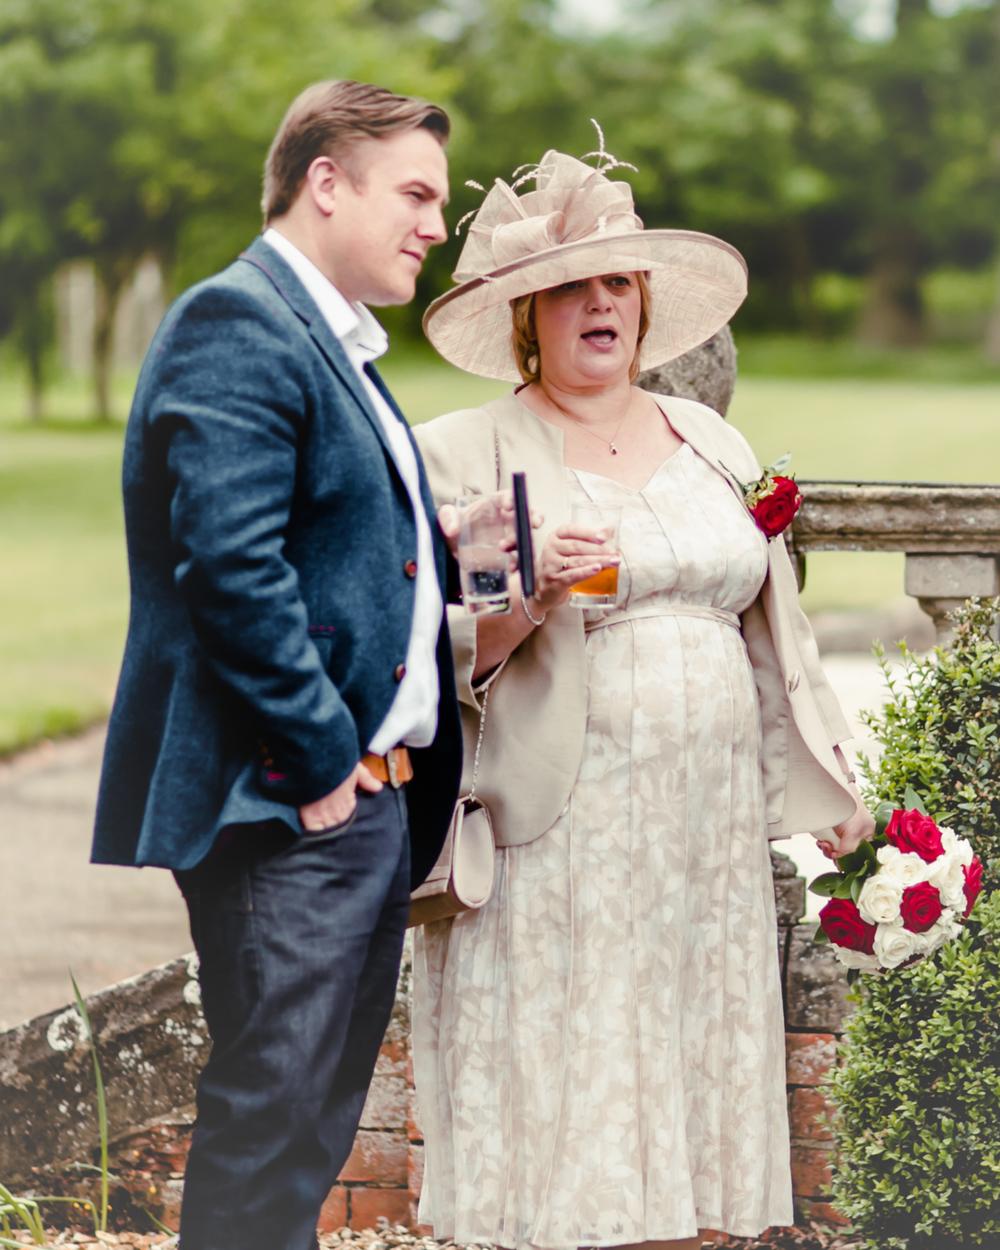 102- Harriet and Jack Kelham House Country Manor Hotel Wedding in Newark UK Photography by Pamela and Mark Pugh WWW.MPMEDIA.CO.UK -2.JPG